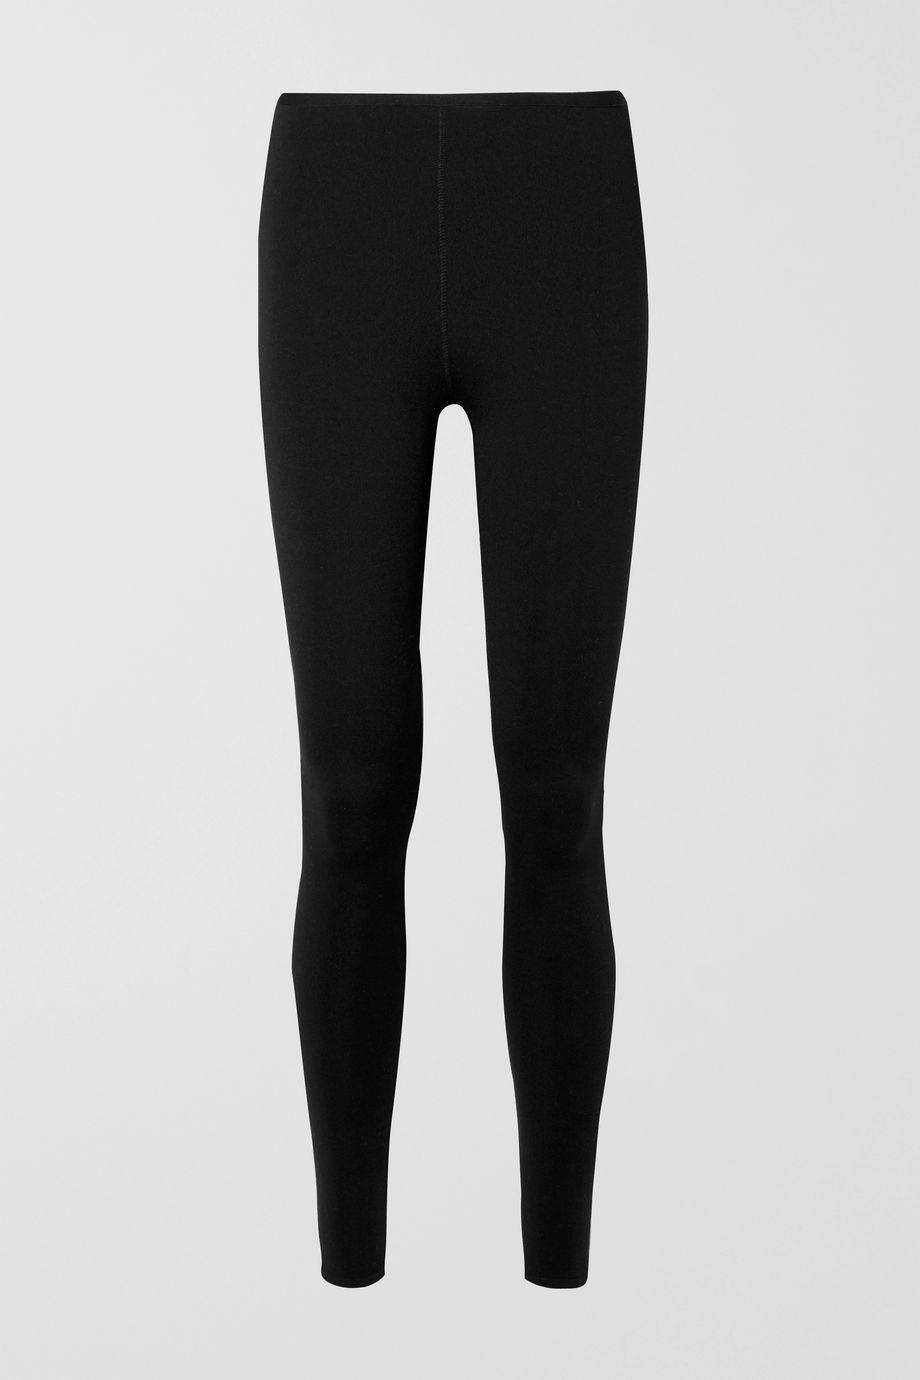 Alaïa Stretch wool-blend leggings